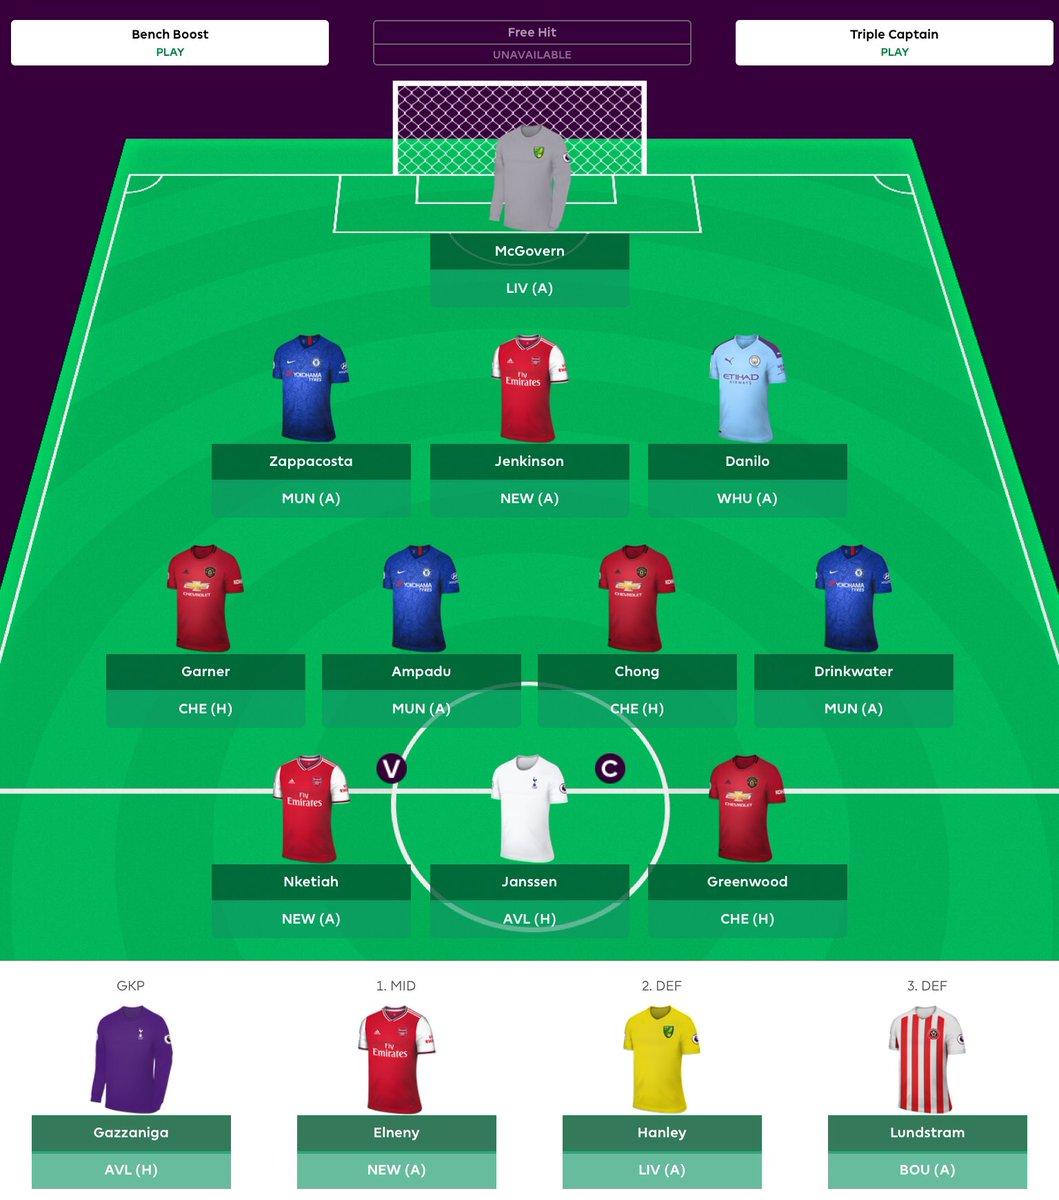 Best Fantasy 2020 Always Cheating Fantasy Premier League (#FPL) on Twitter: